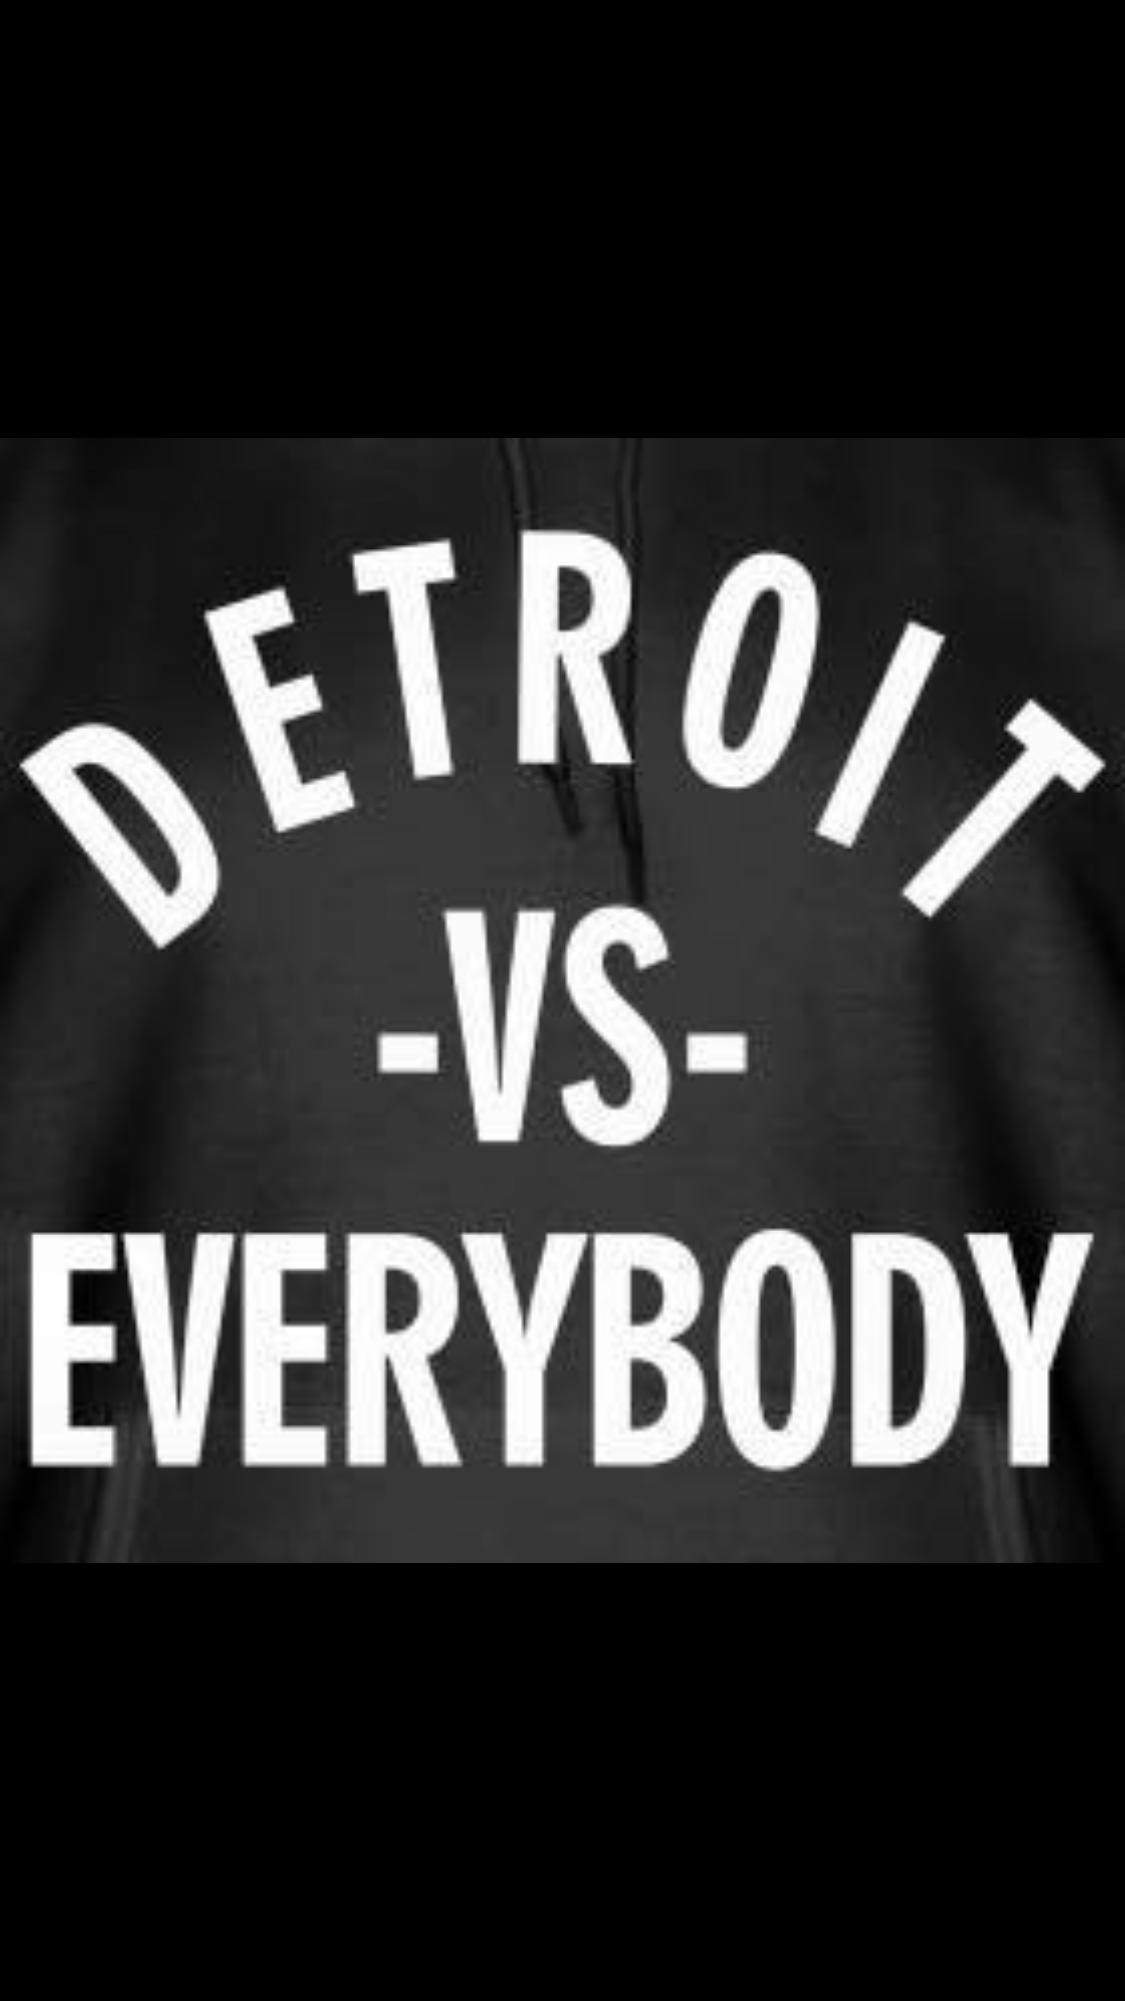 Pin By Horatio Valentin On Motor City Detroit Vs Everybody Motor City Calm Artwork